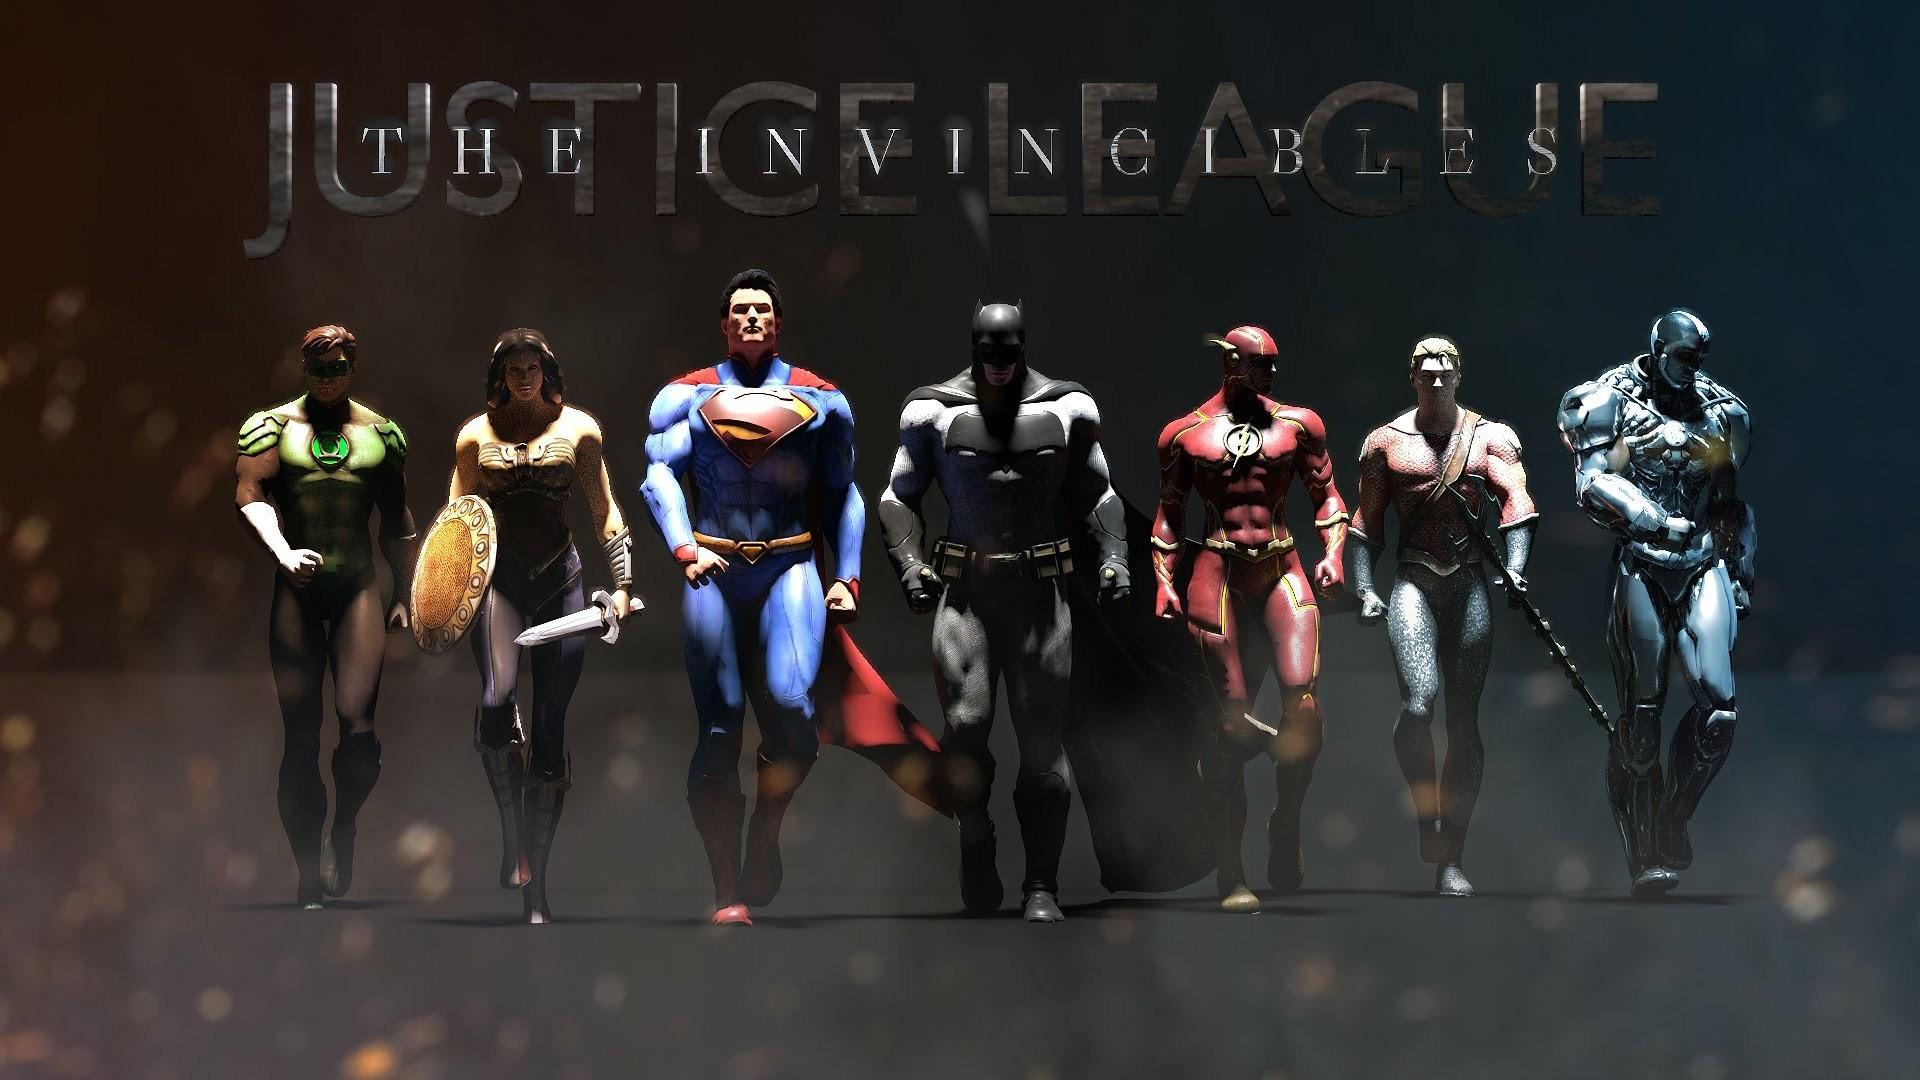 Superhero Hd Wallpapers Iphone Justice League Logo Wallpaper 65 Images